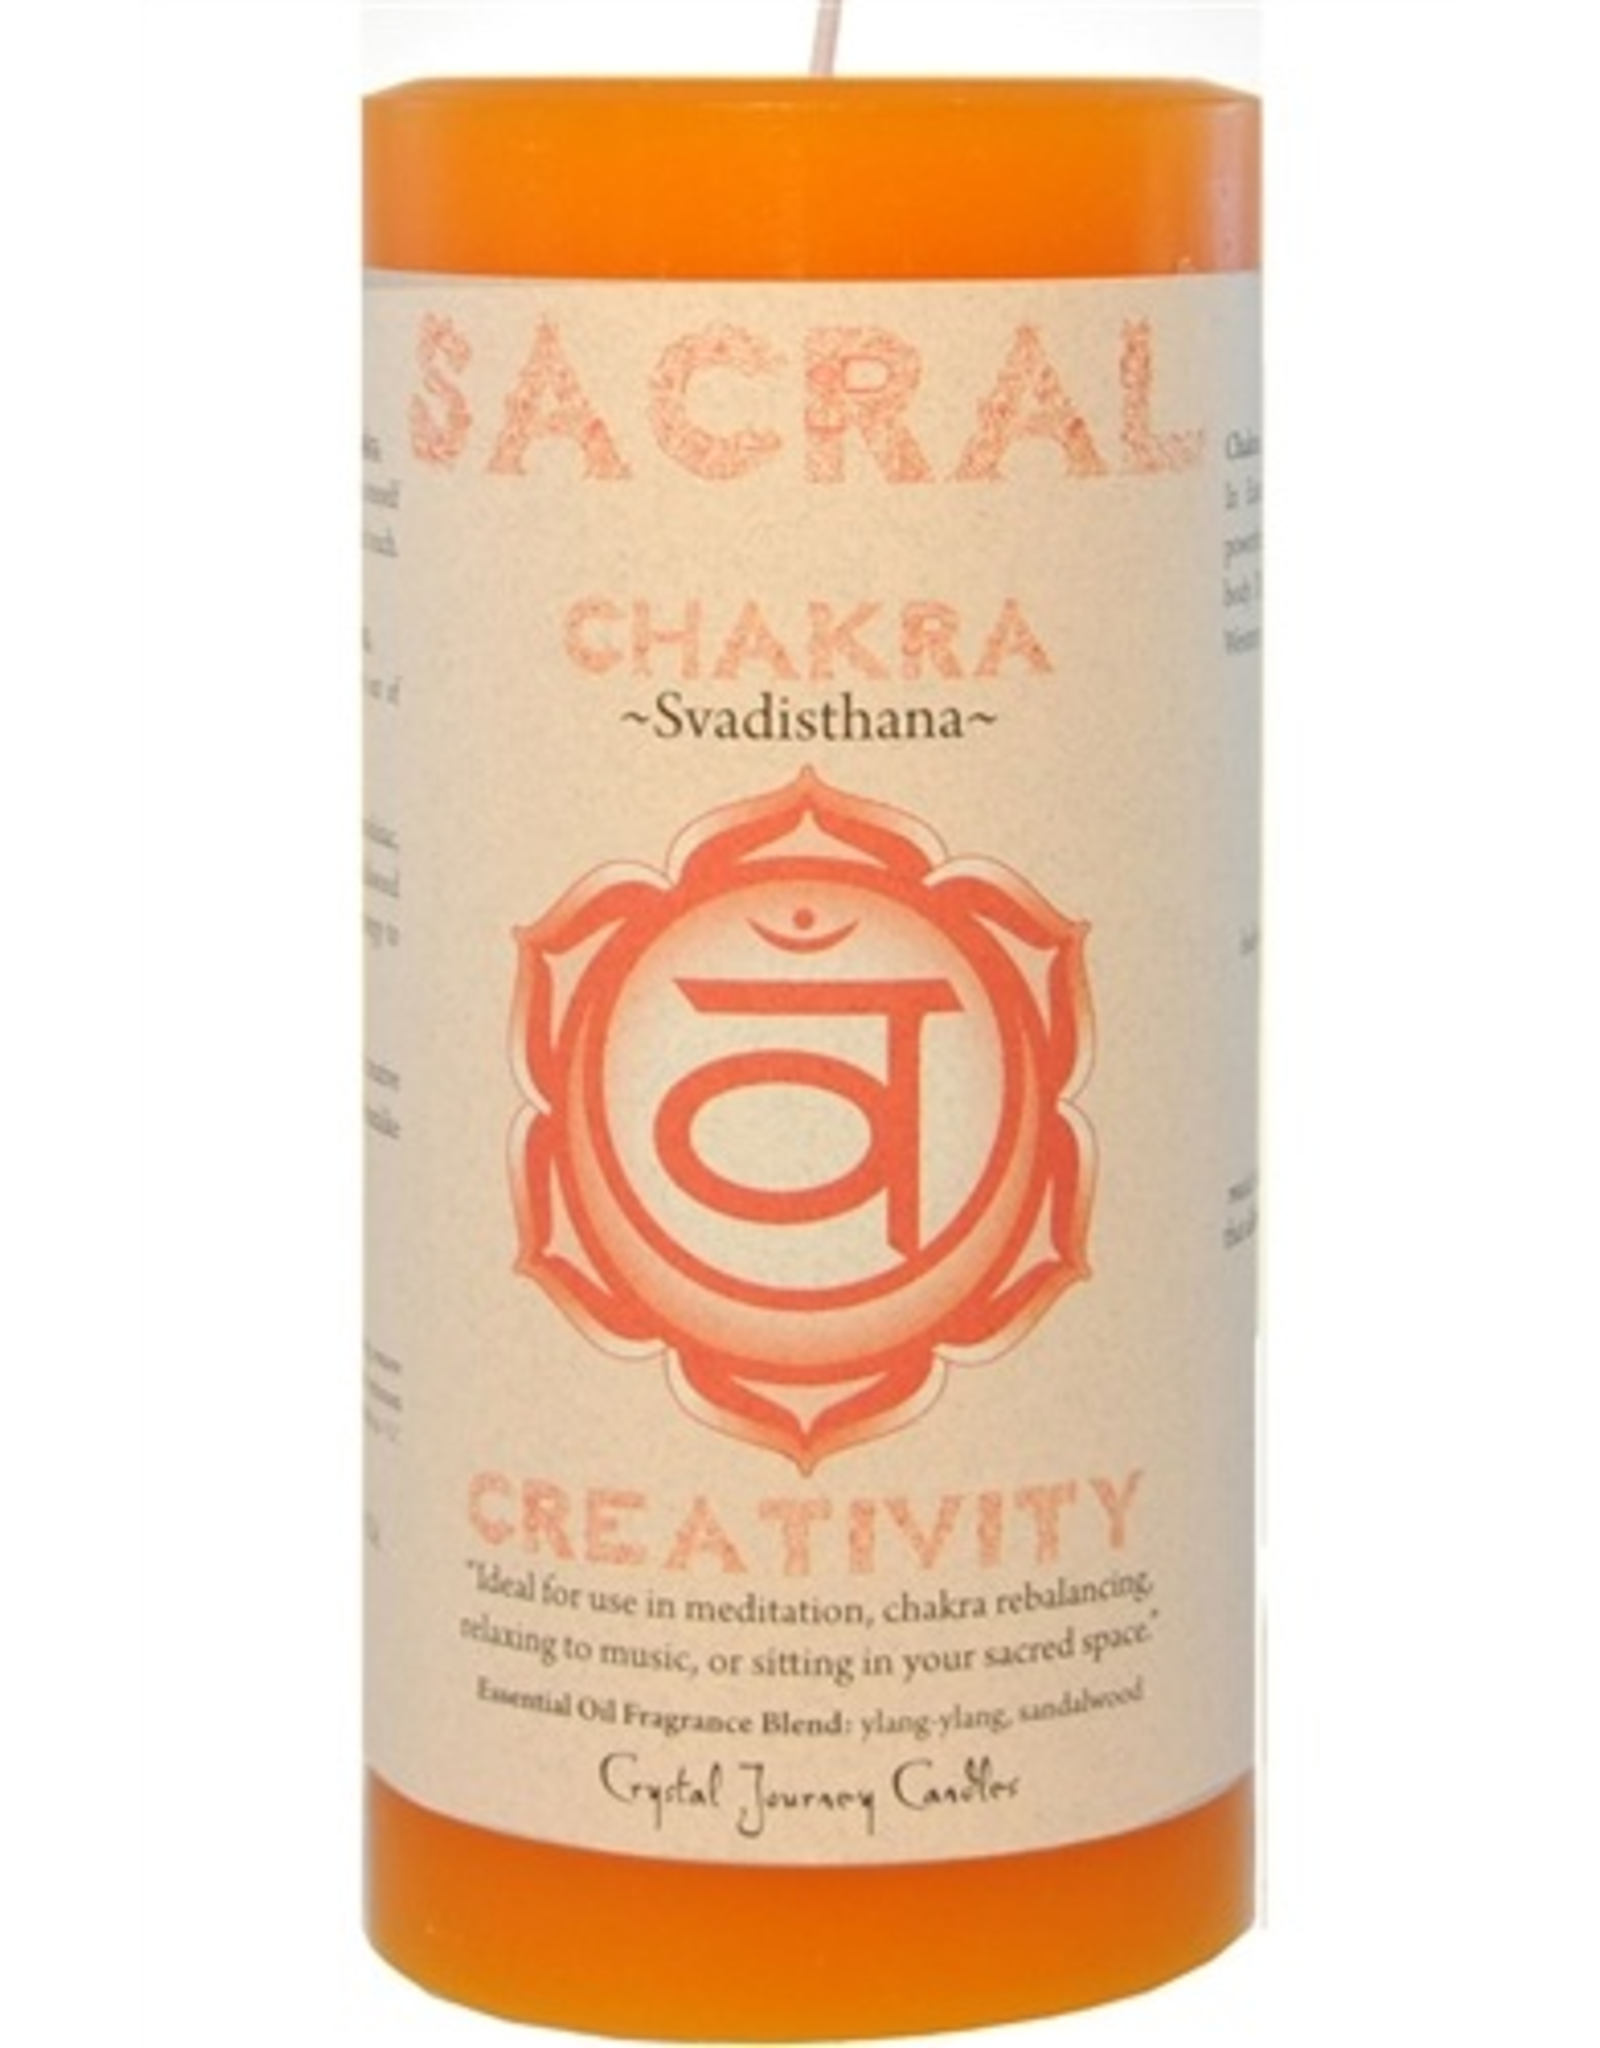 Crystal Journey Chakra Pillar 3x6 Candle-Sacral